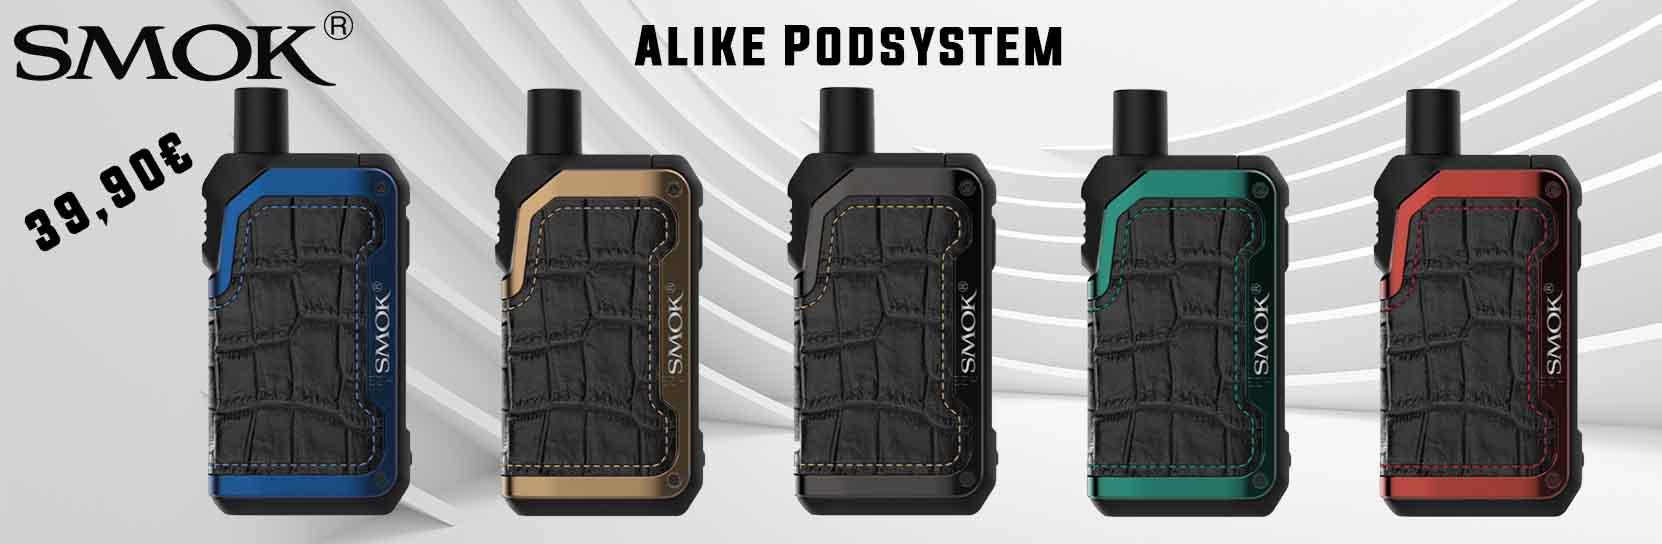 Smok-Alike-Podsystem-Banner-WEB